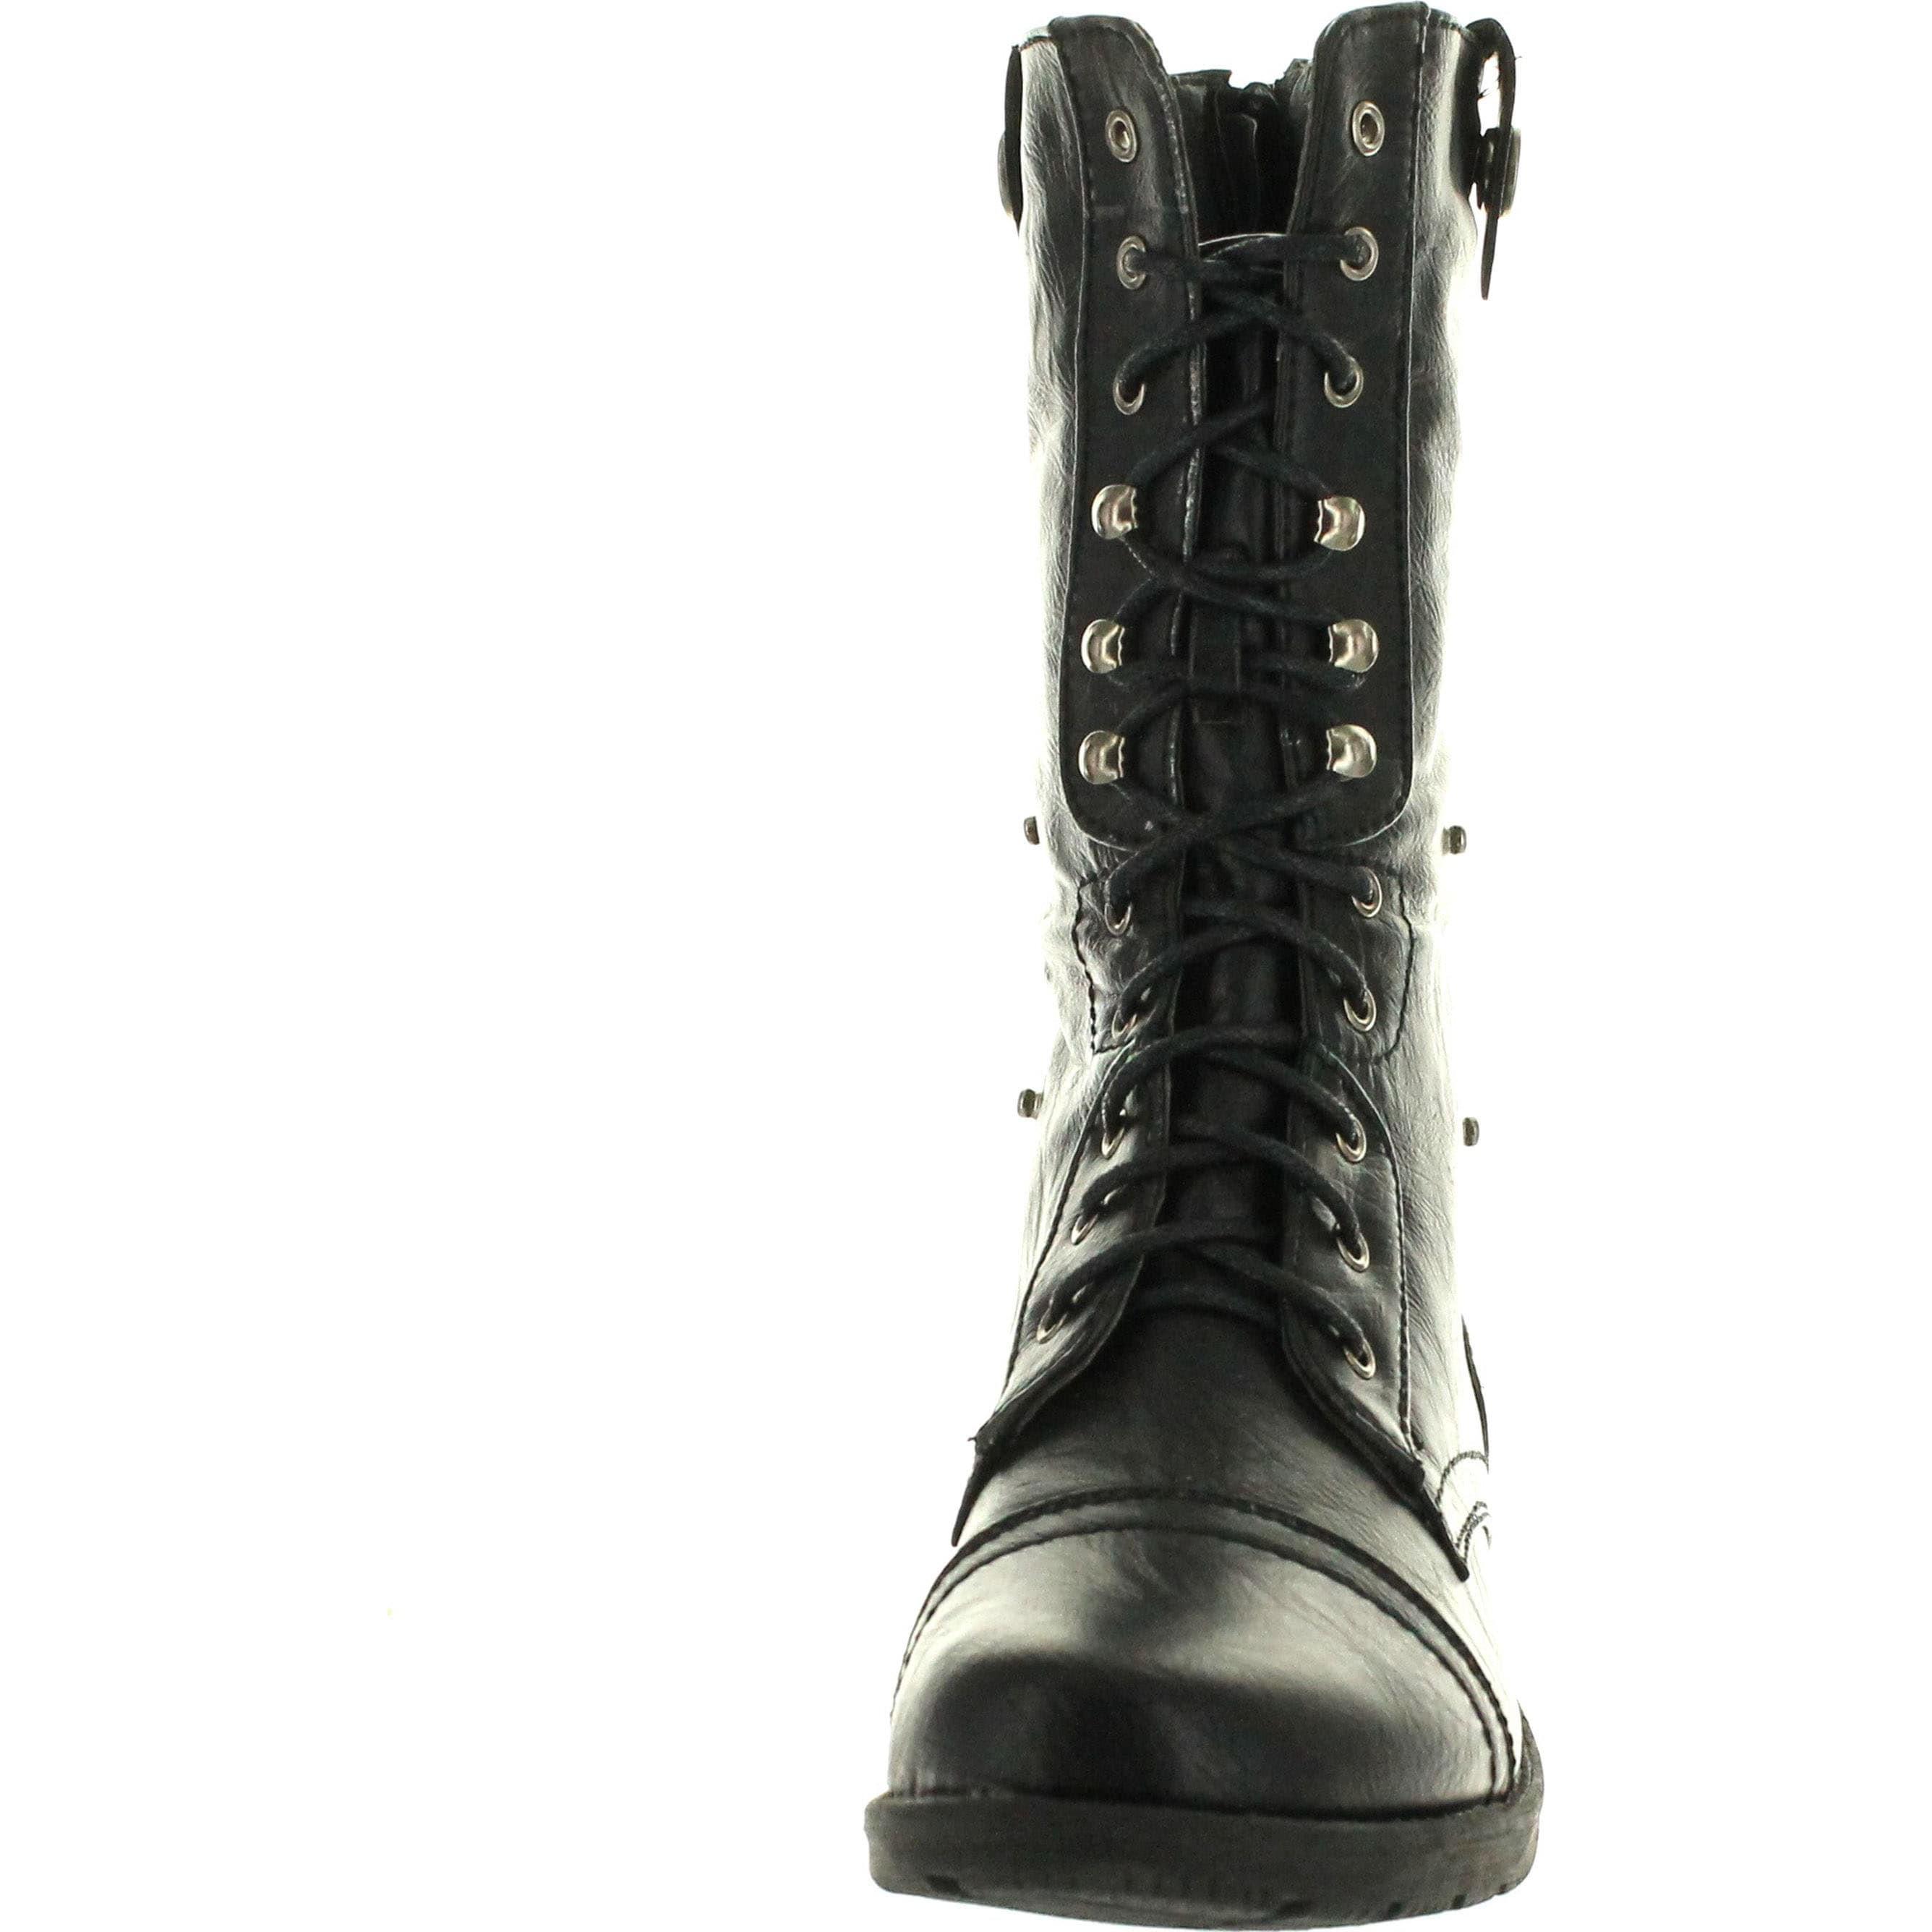 2b7fc67627f Reneeze Womens Dy-B1307 Foldable Lace Up Shaft Back Zipper Flat Heel  Mid-Calf Combat Riding Boots - Black Red